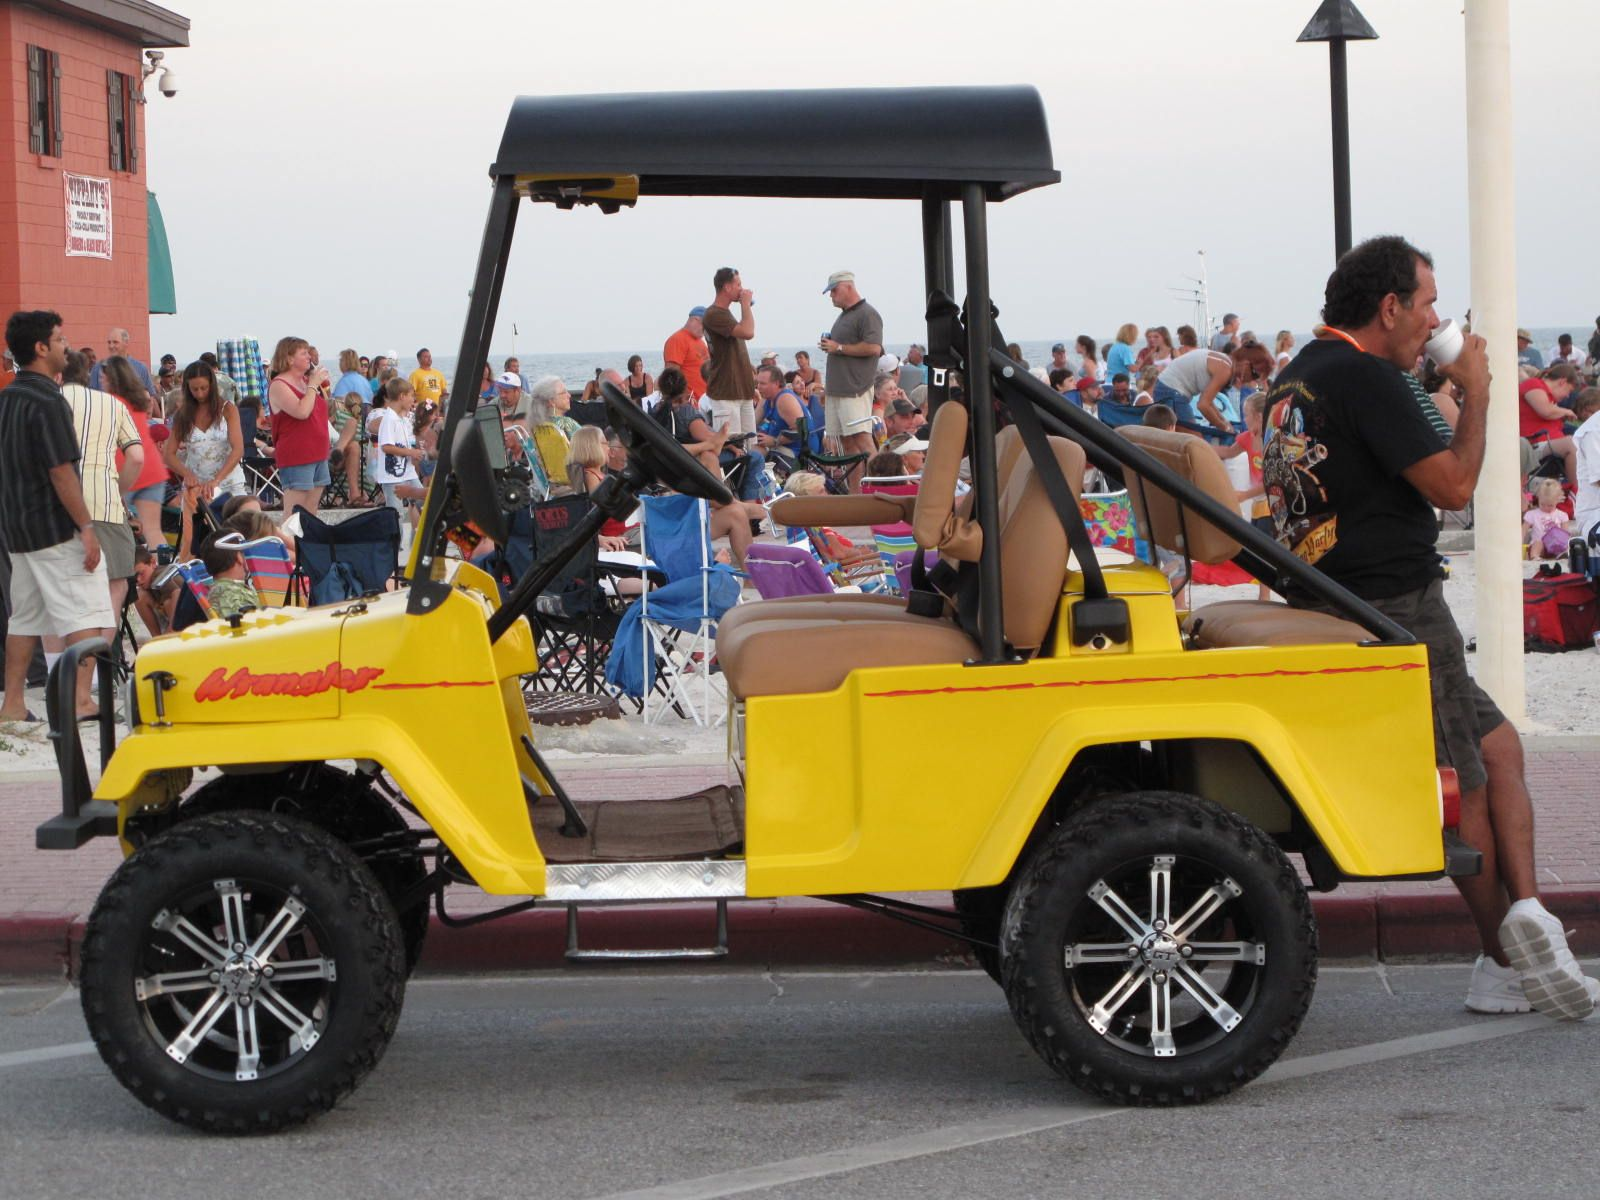 At Bands on the beach, Pensacola Beach, FL. Golf carts